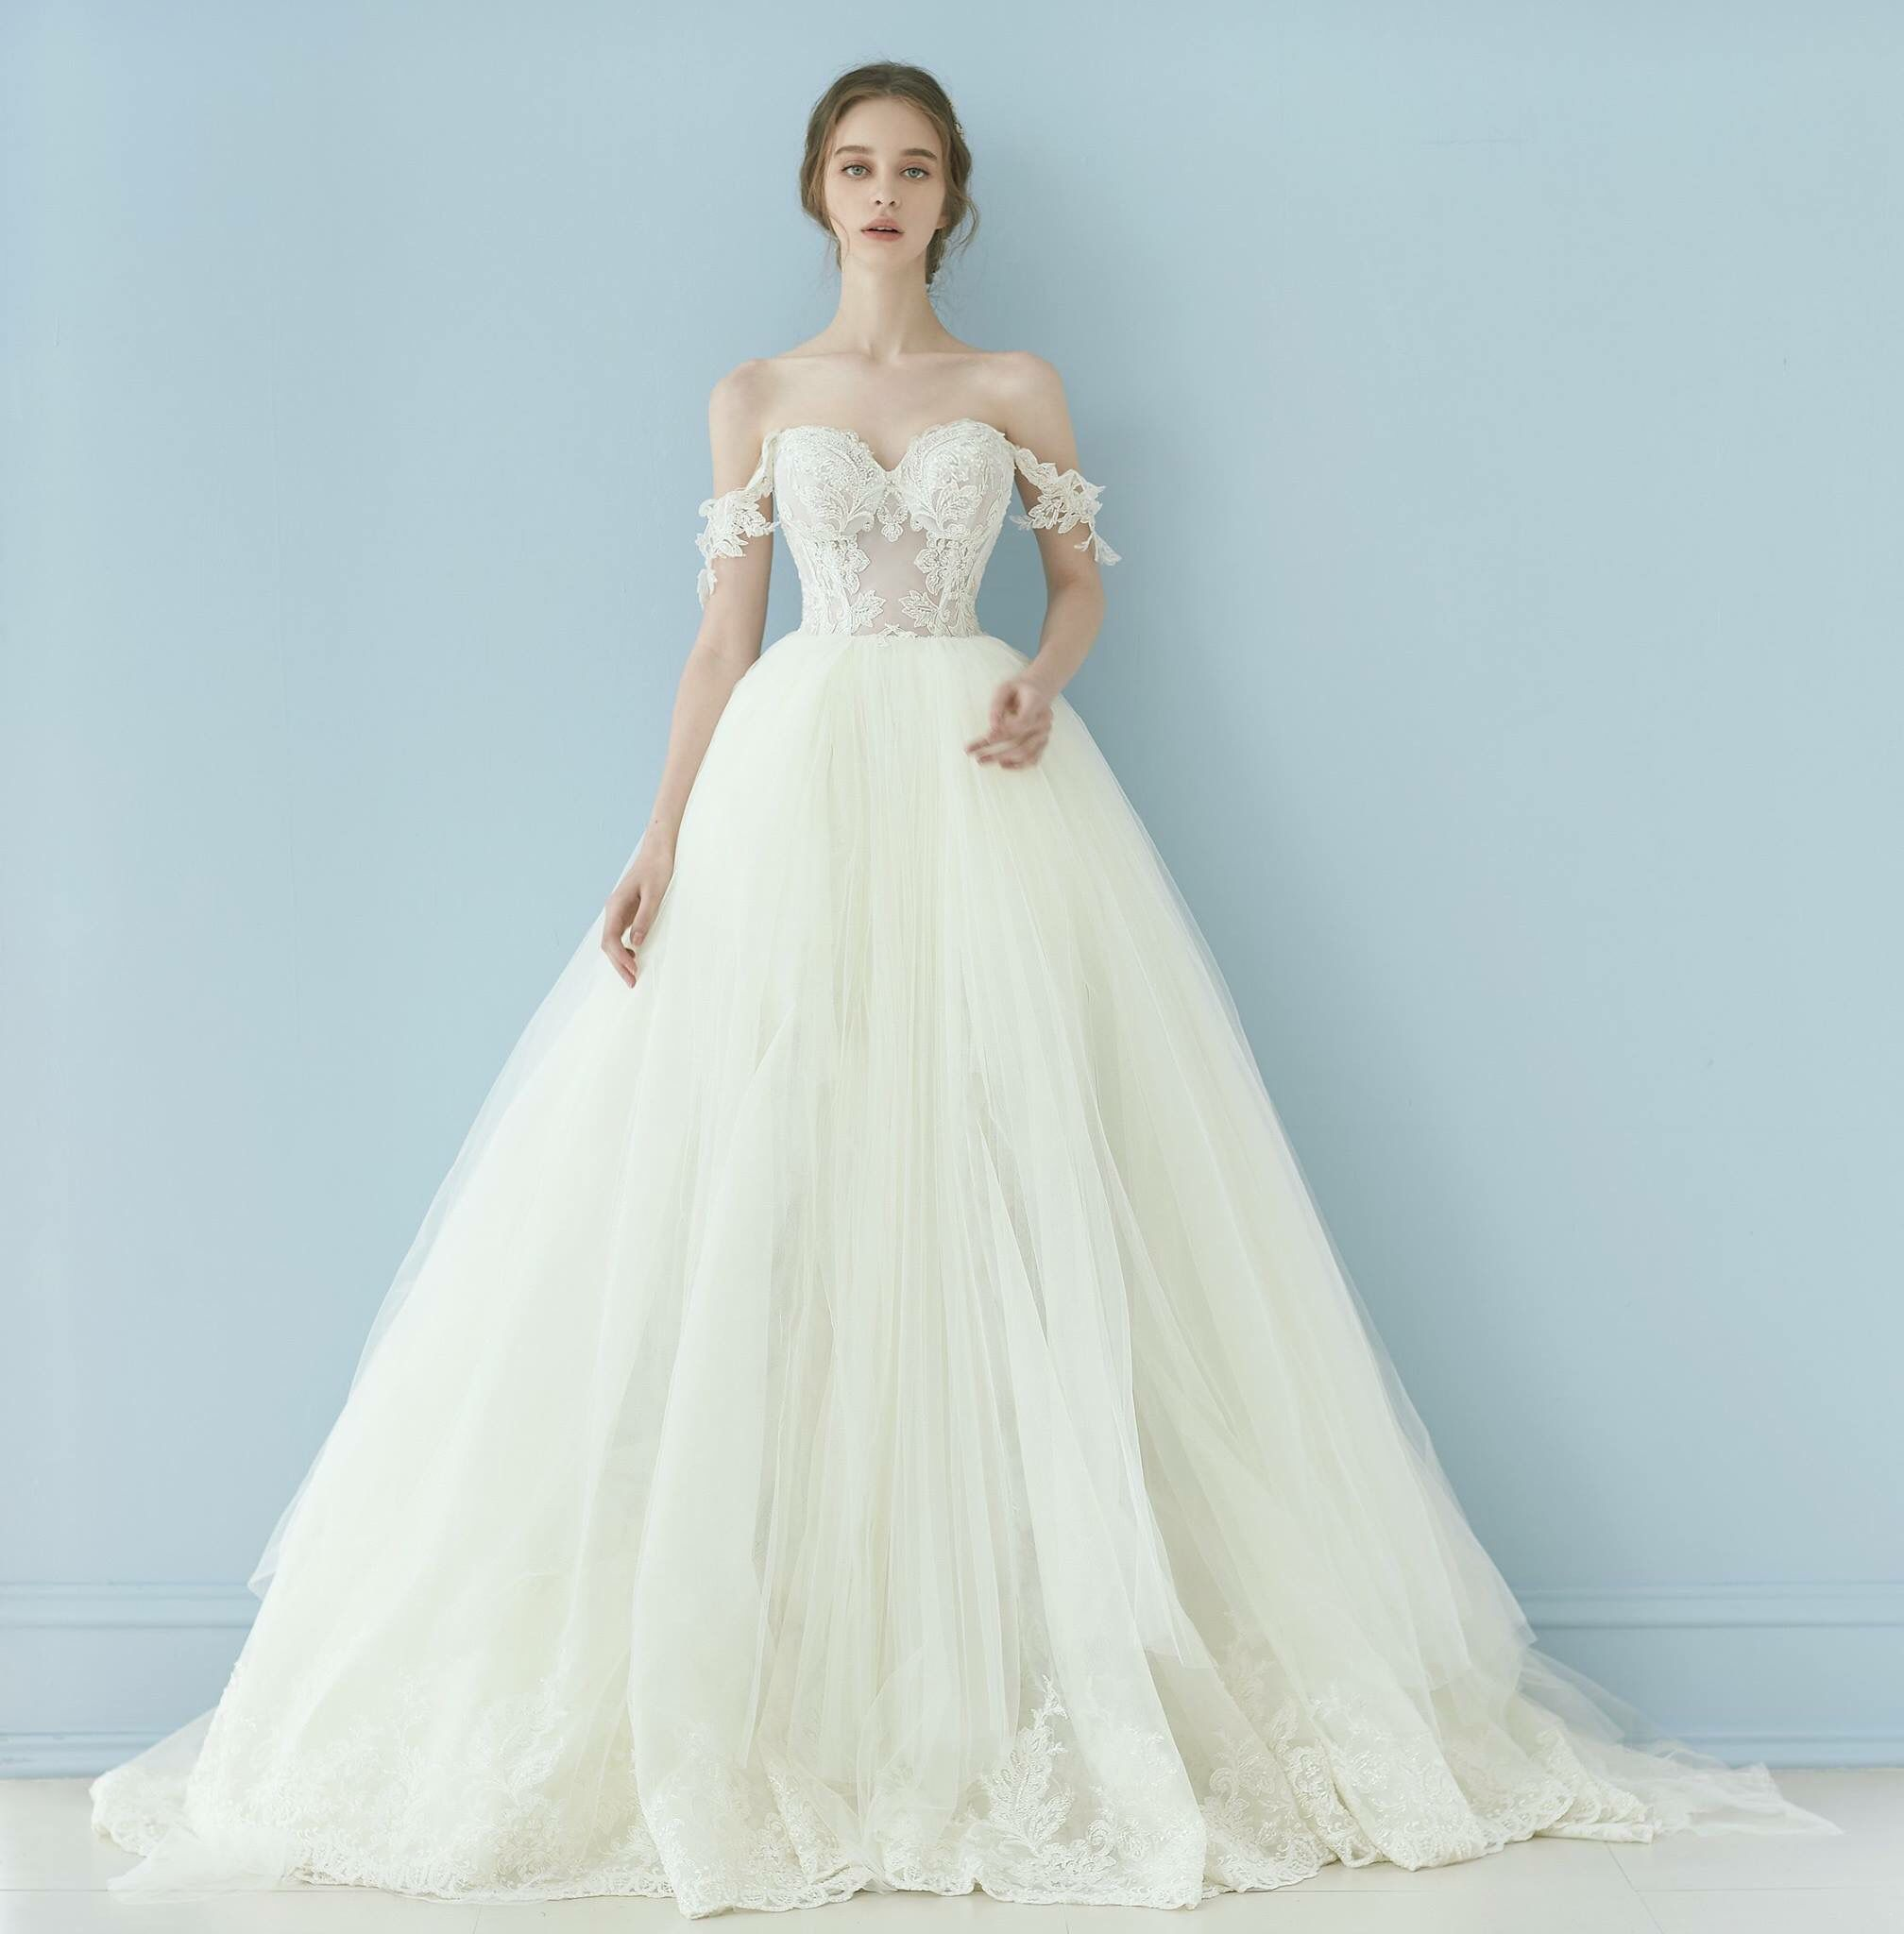 Outstanding Vestidos De Novia La Sposa 2015 Photos - All Wedding ...